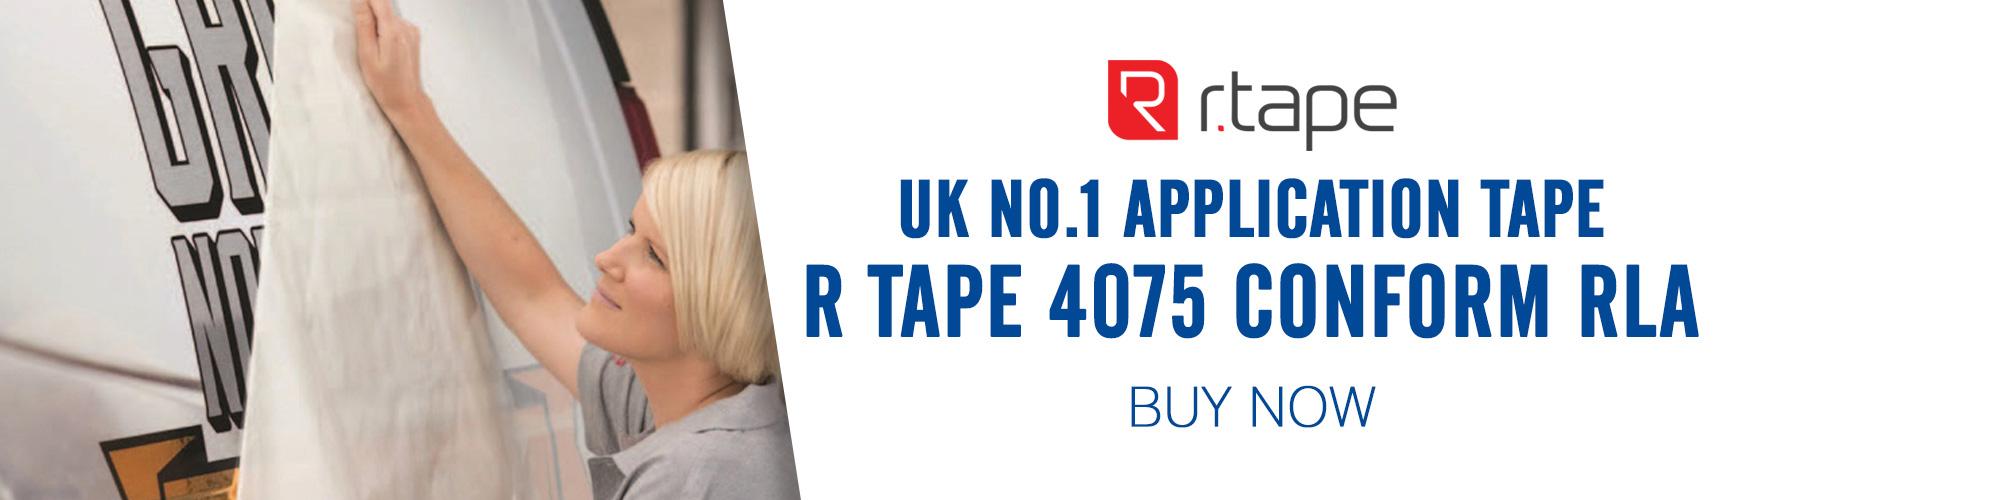 Victory Design - R-Tape Conform 4075RLA Application Tape